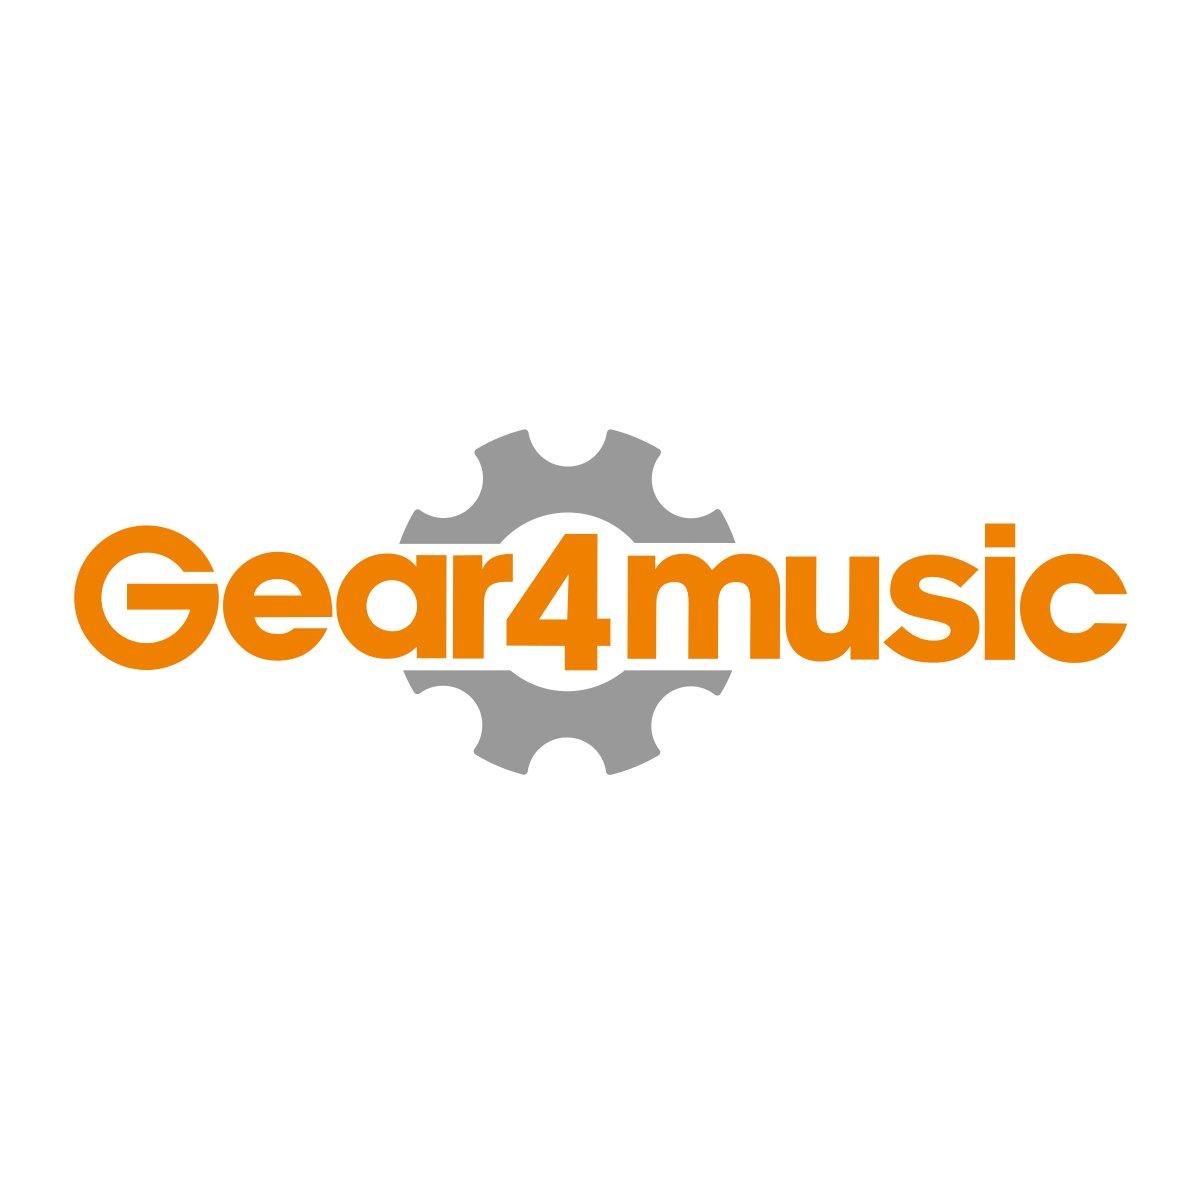 evans ec snare drum head 14 inch at gear4music. Black Bedroom Furniture Sets. Home Design Ideas